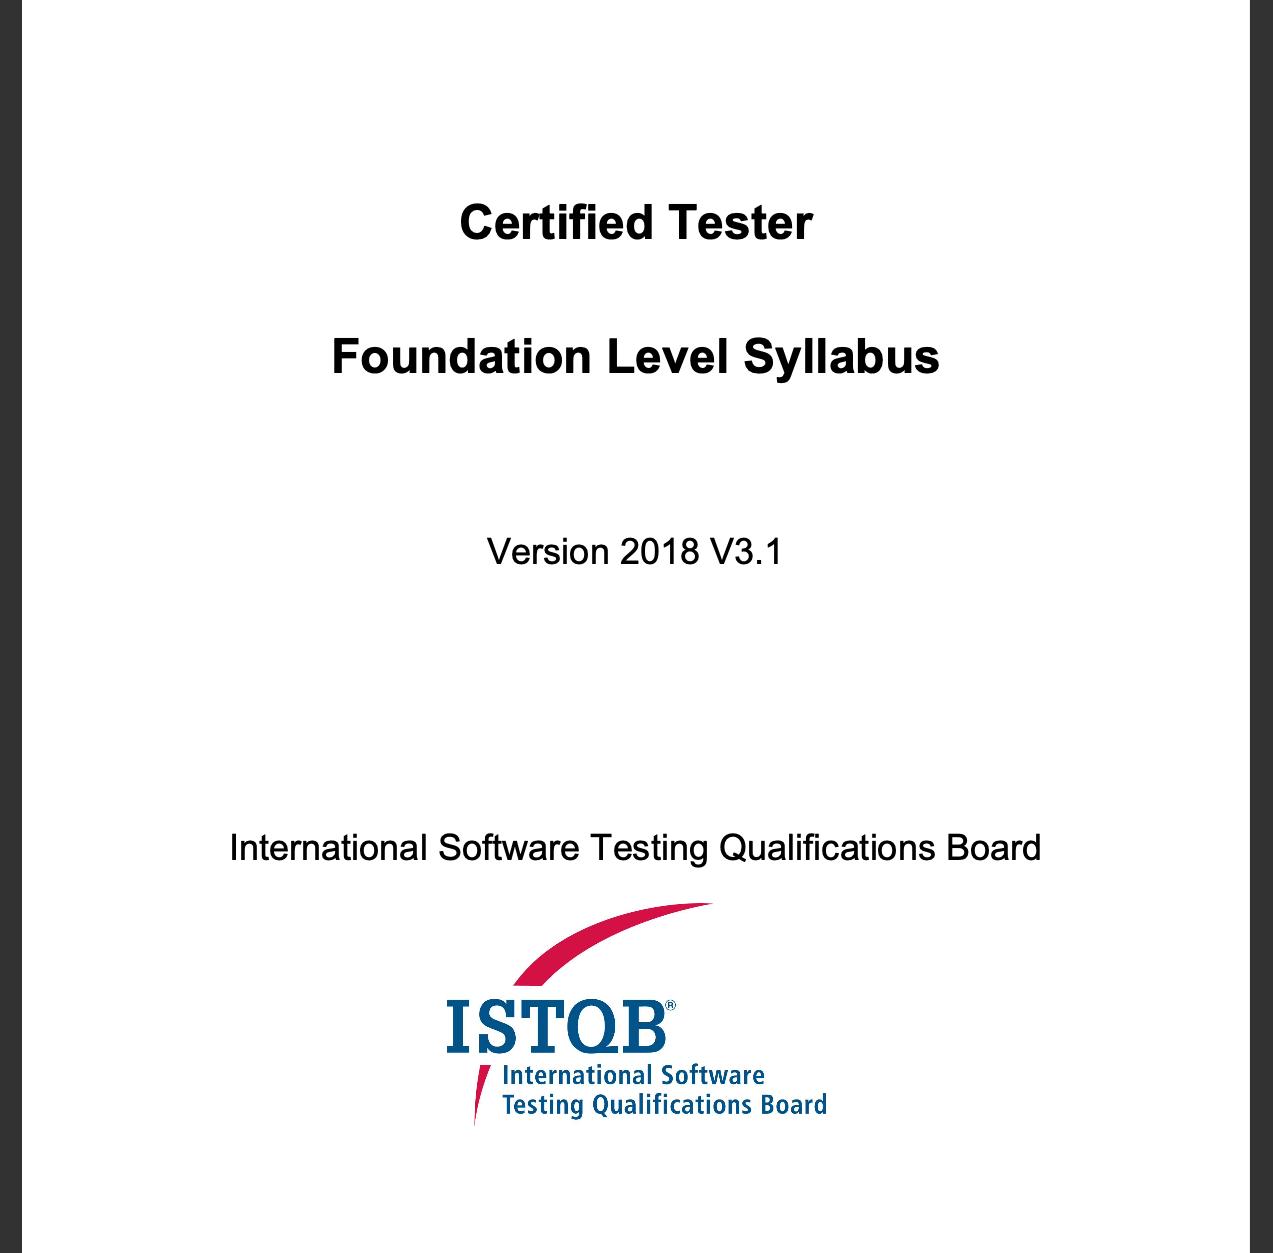 ISTQB FL Syllabus (v. 2018)